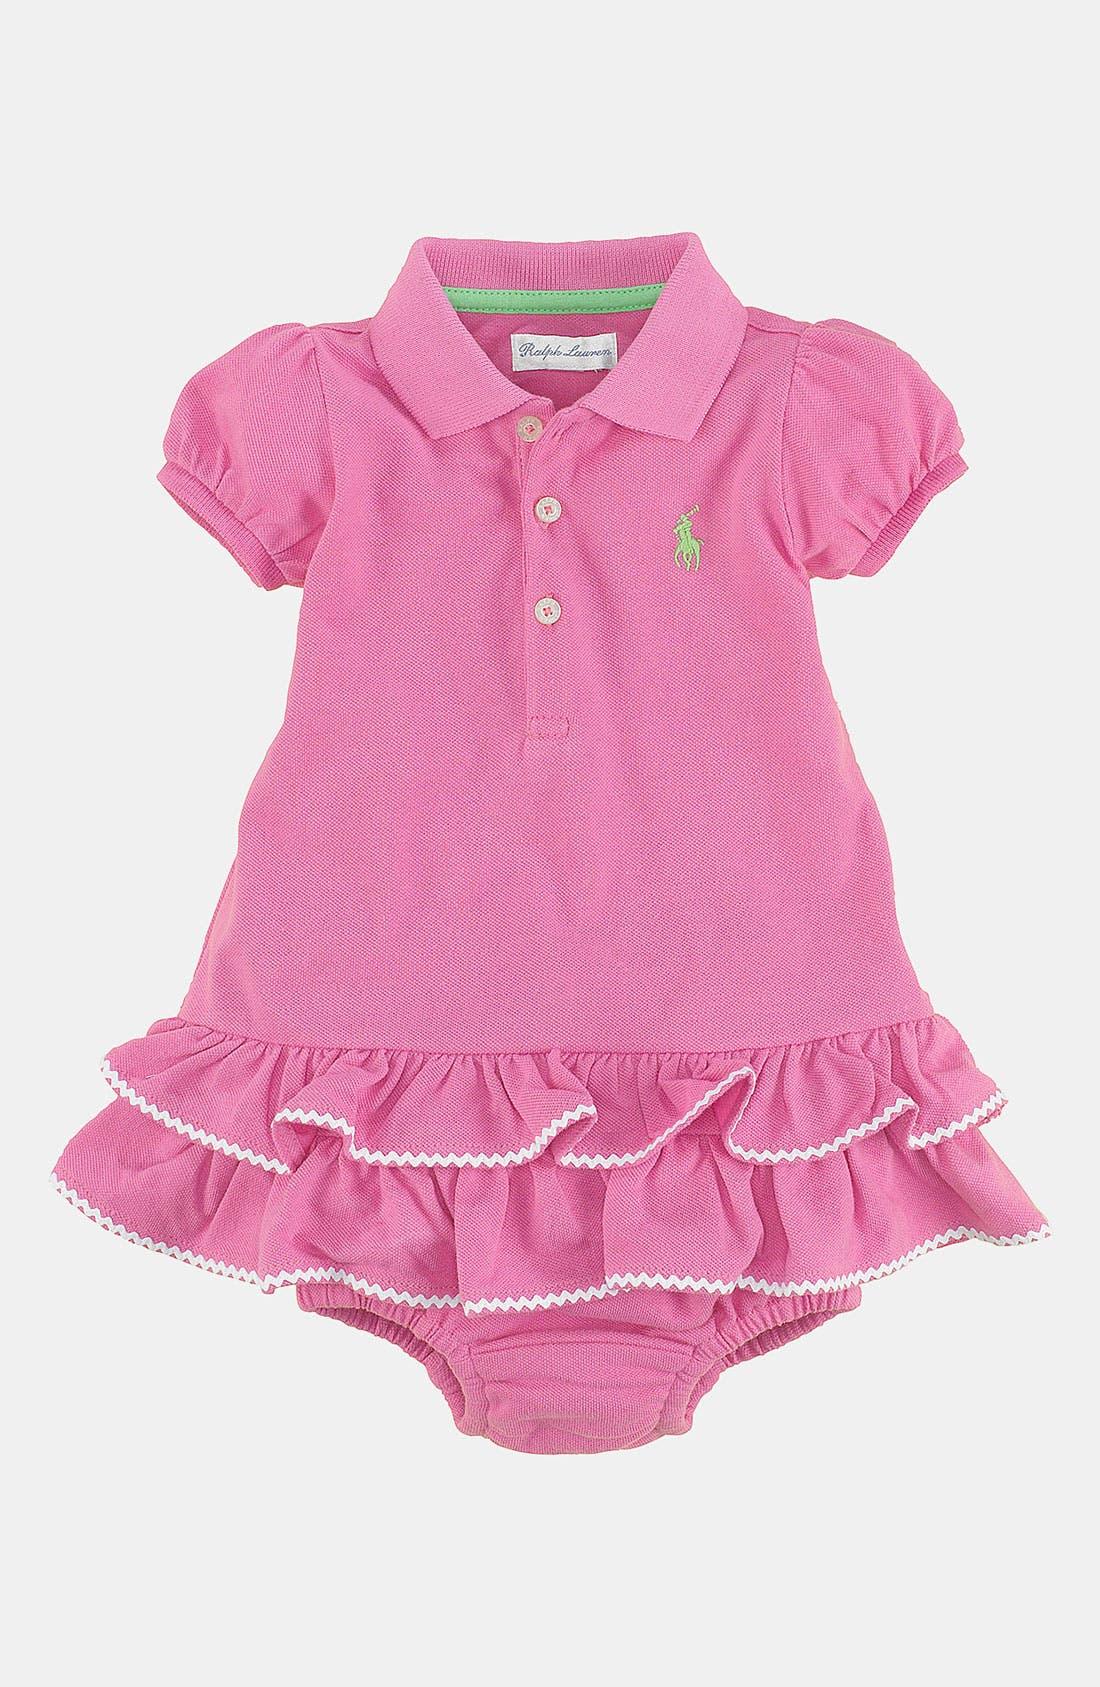 Alternate Image 1 Selected - Ralph Lauren Rickrack Polo Dress & Bloomers (Baby)